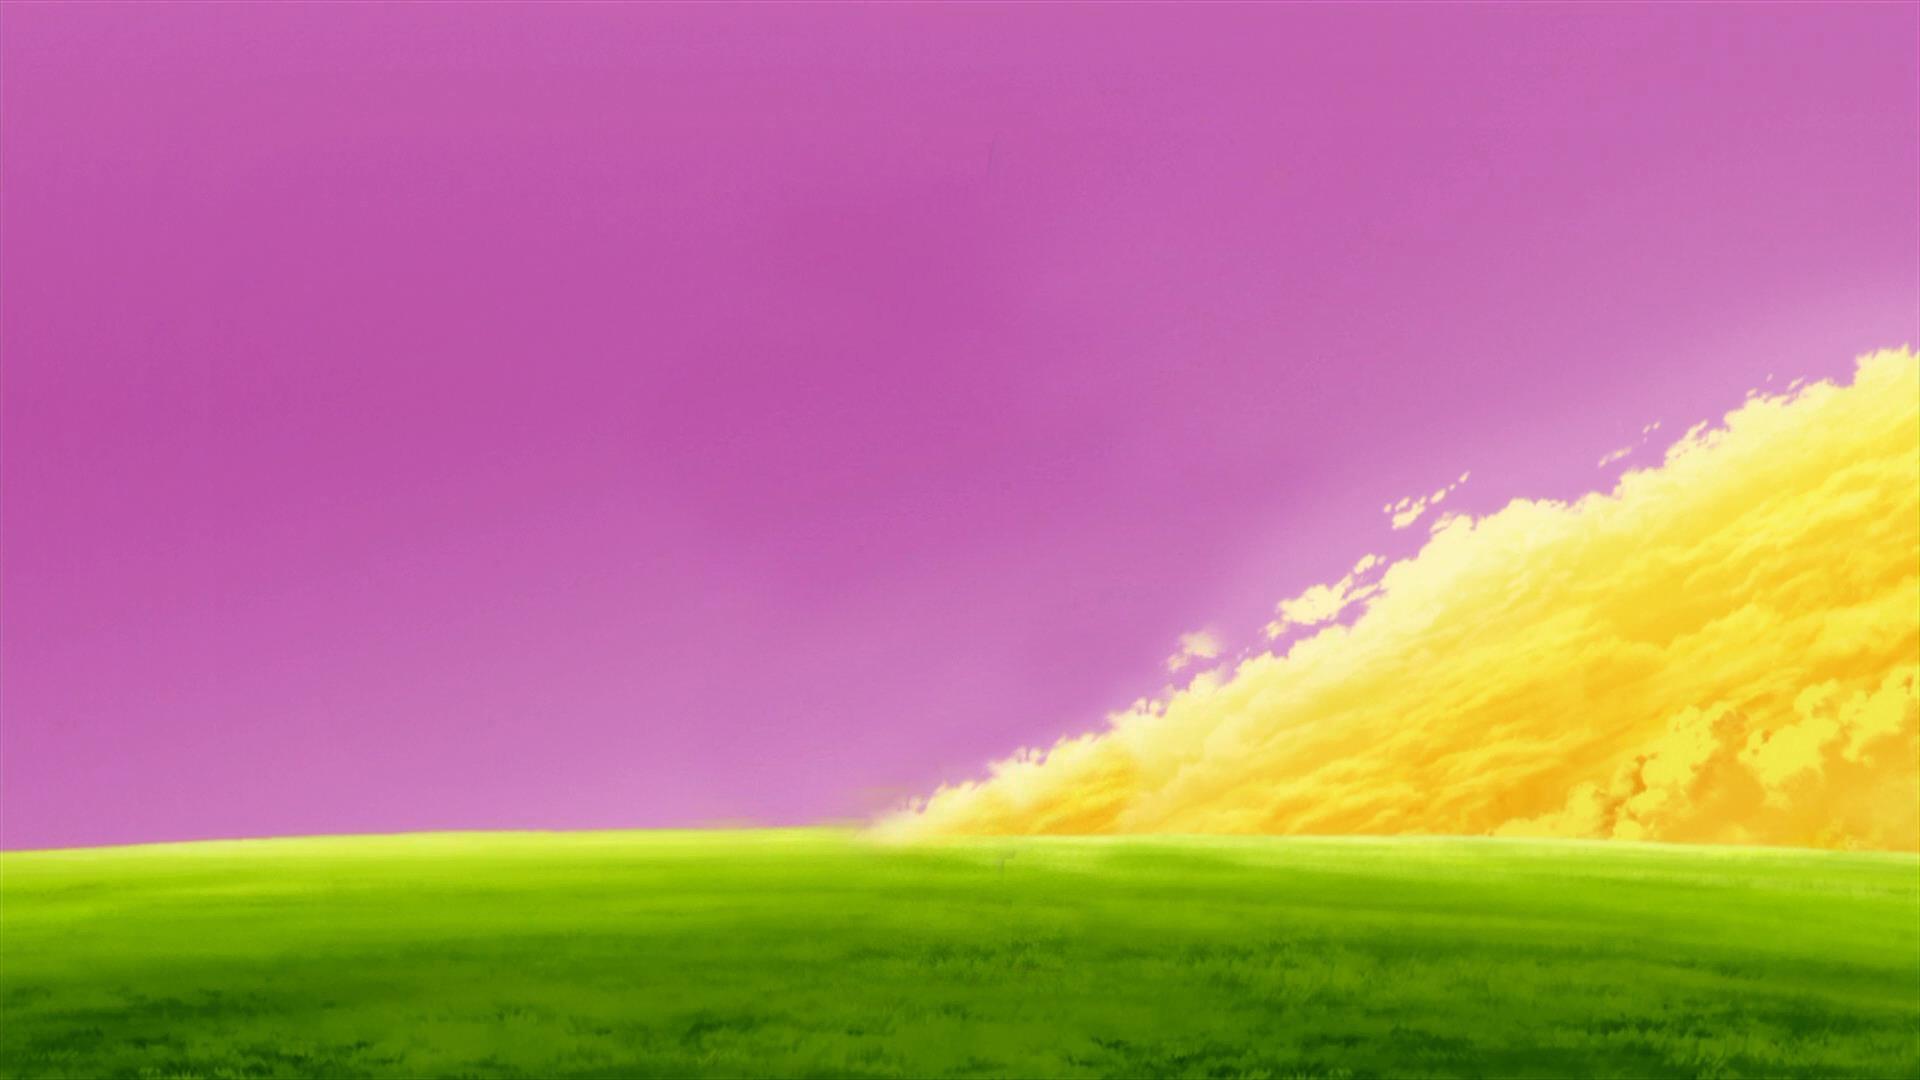 Iphone 5 Backgrounds Pink Kaiosama's world Full ...